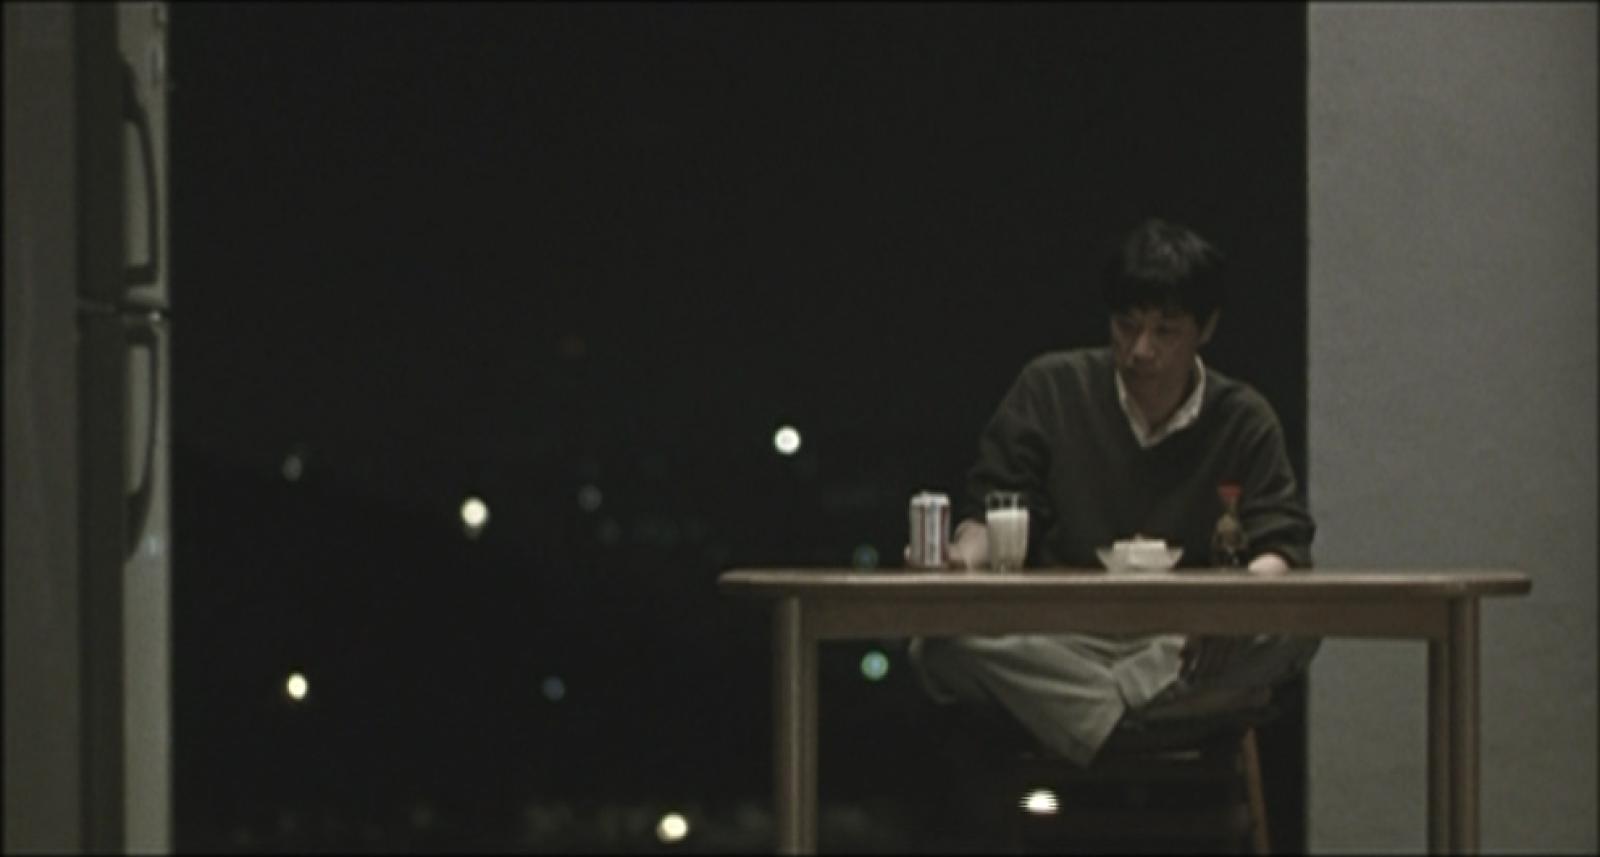 Film Review: Tony Takitani (2004) by Jun Ichikawa